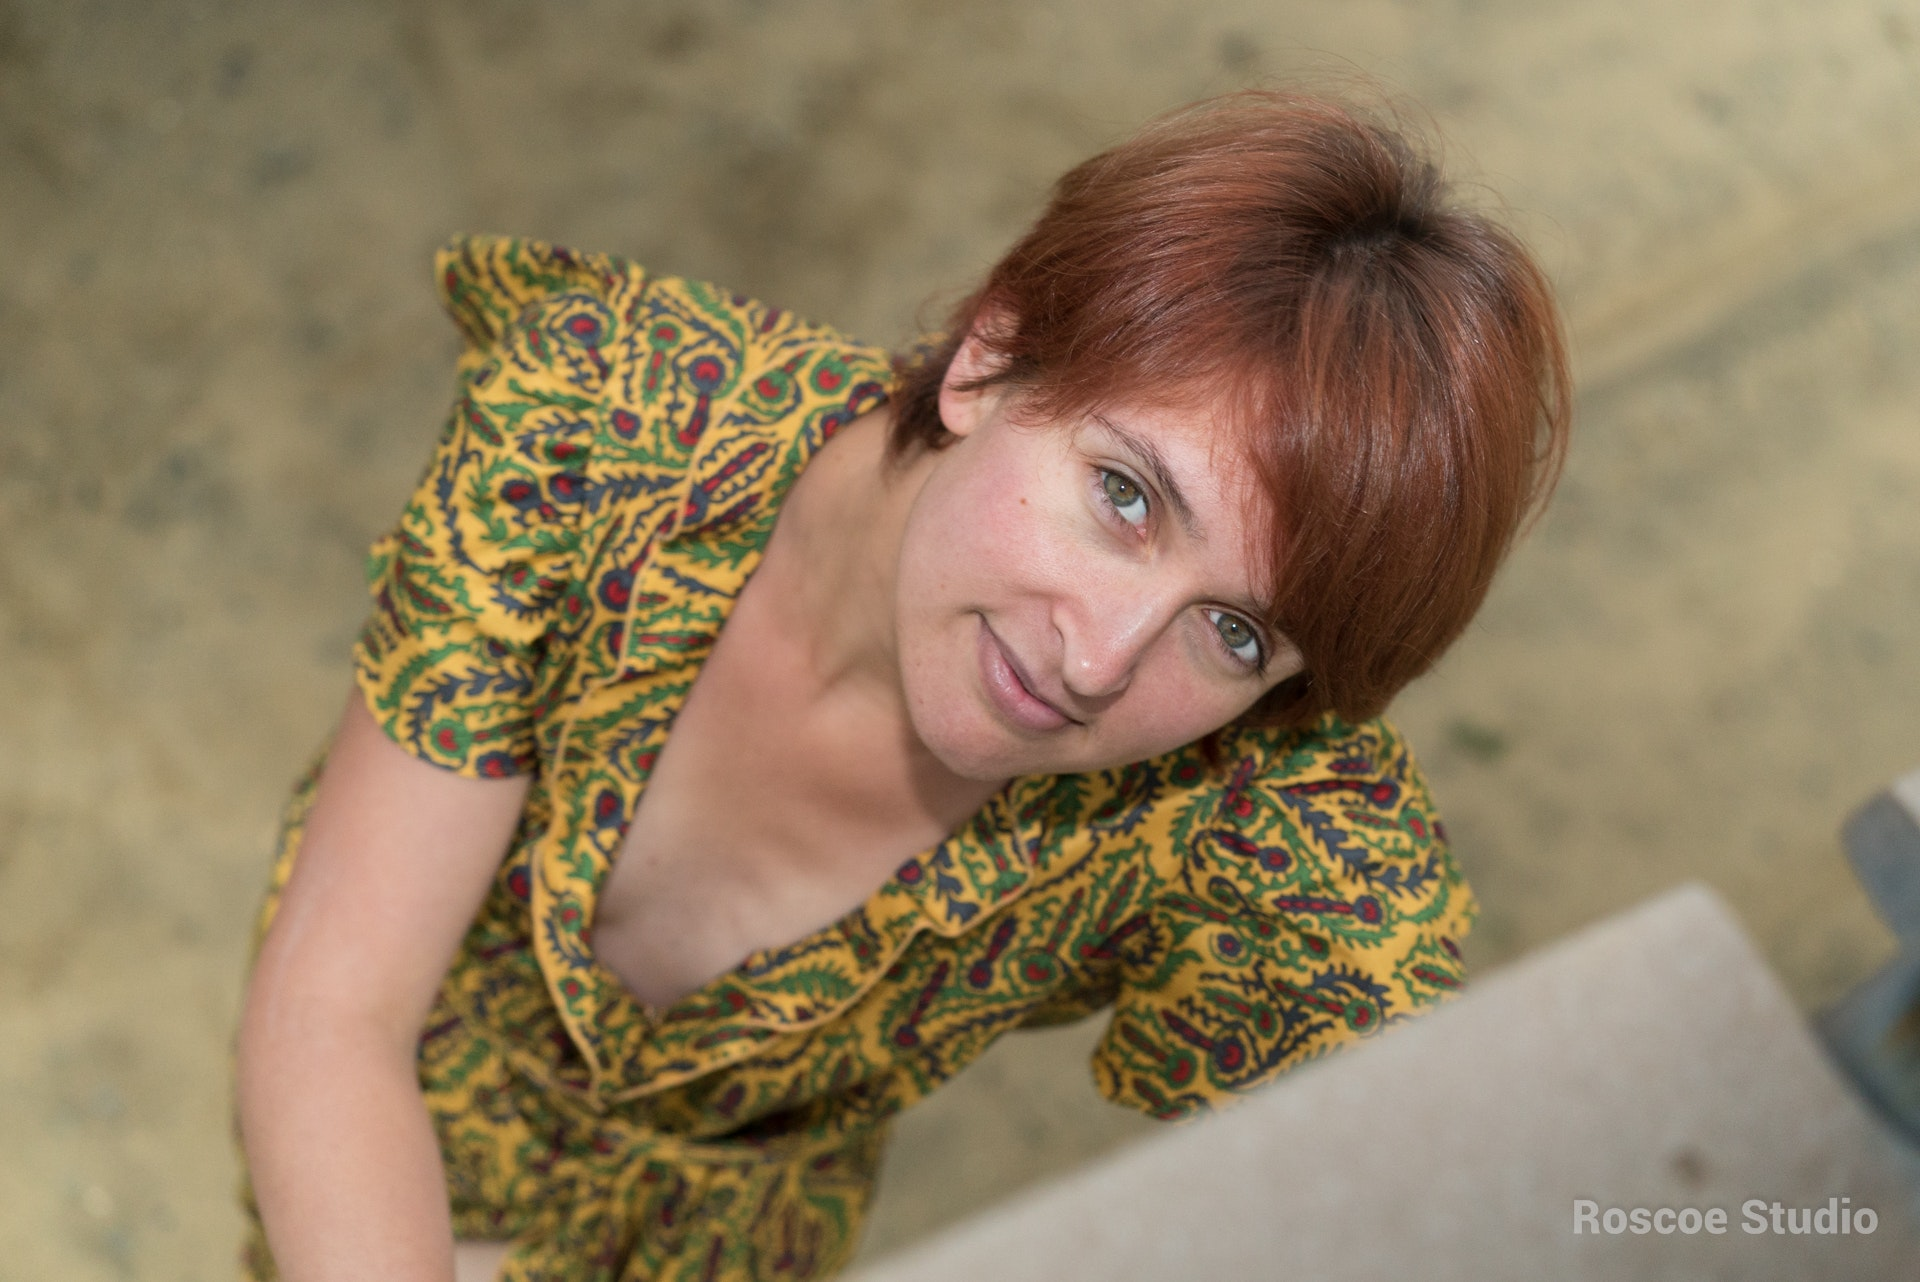 Heather Tanner's Model portfolio